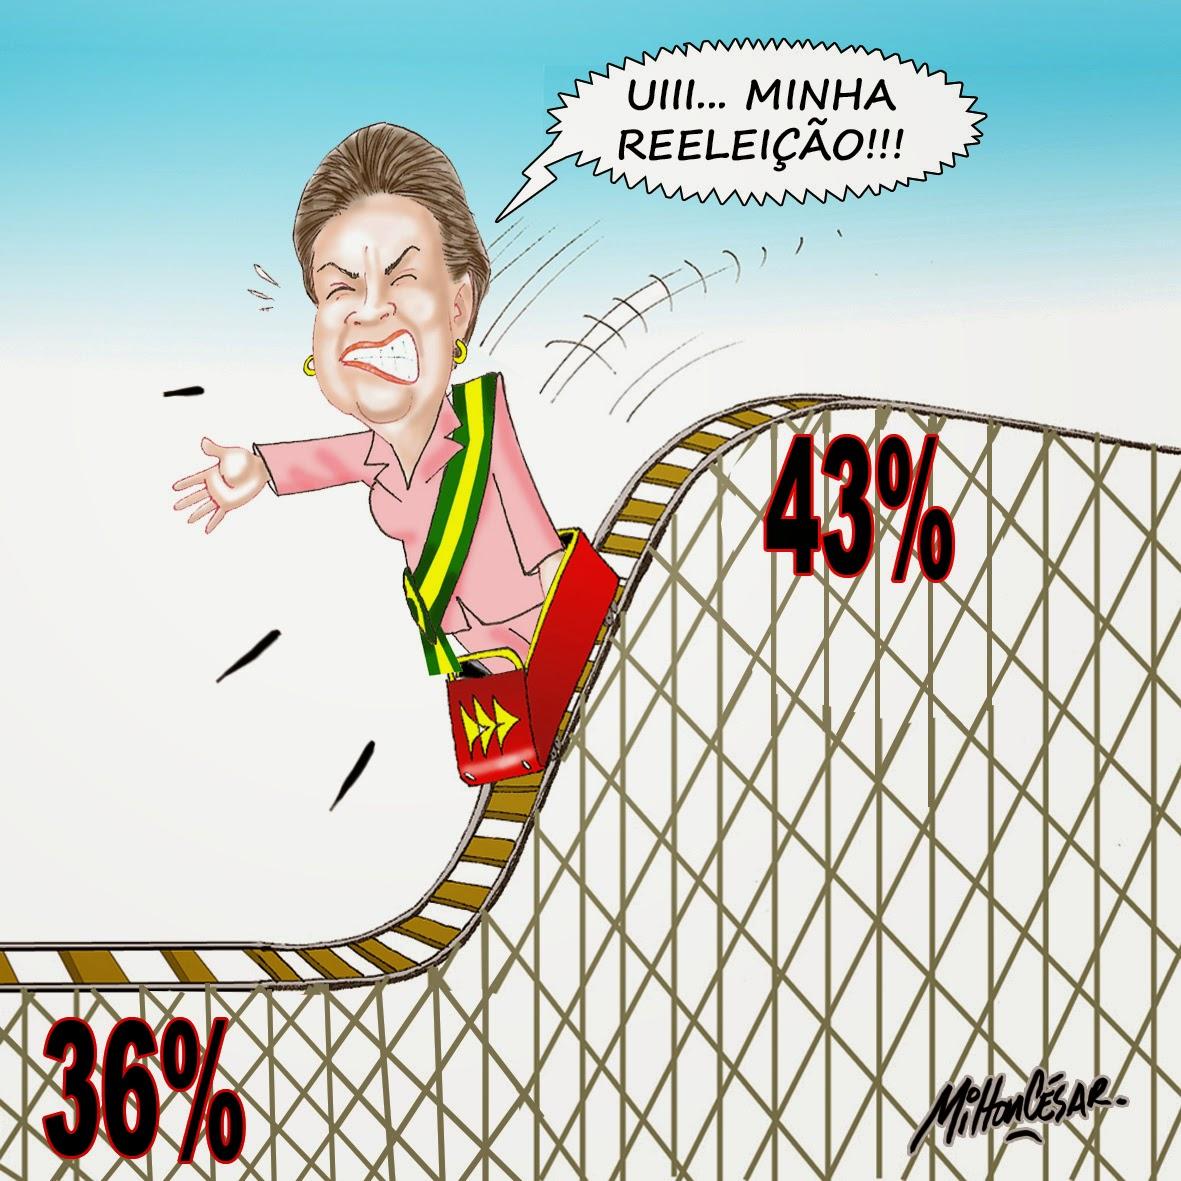 http://4.bp.blogspot.com/-24aZ3XHXAts/U27M317BwQI/AAAAAAABvSE/qrpkFbQsNxc/s1600/Charge-31-Mar%C3%A7o-2014-Queda-da-Dilma.jpg